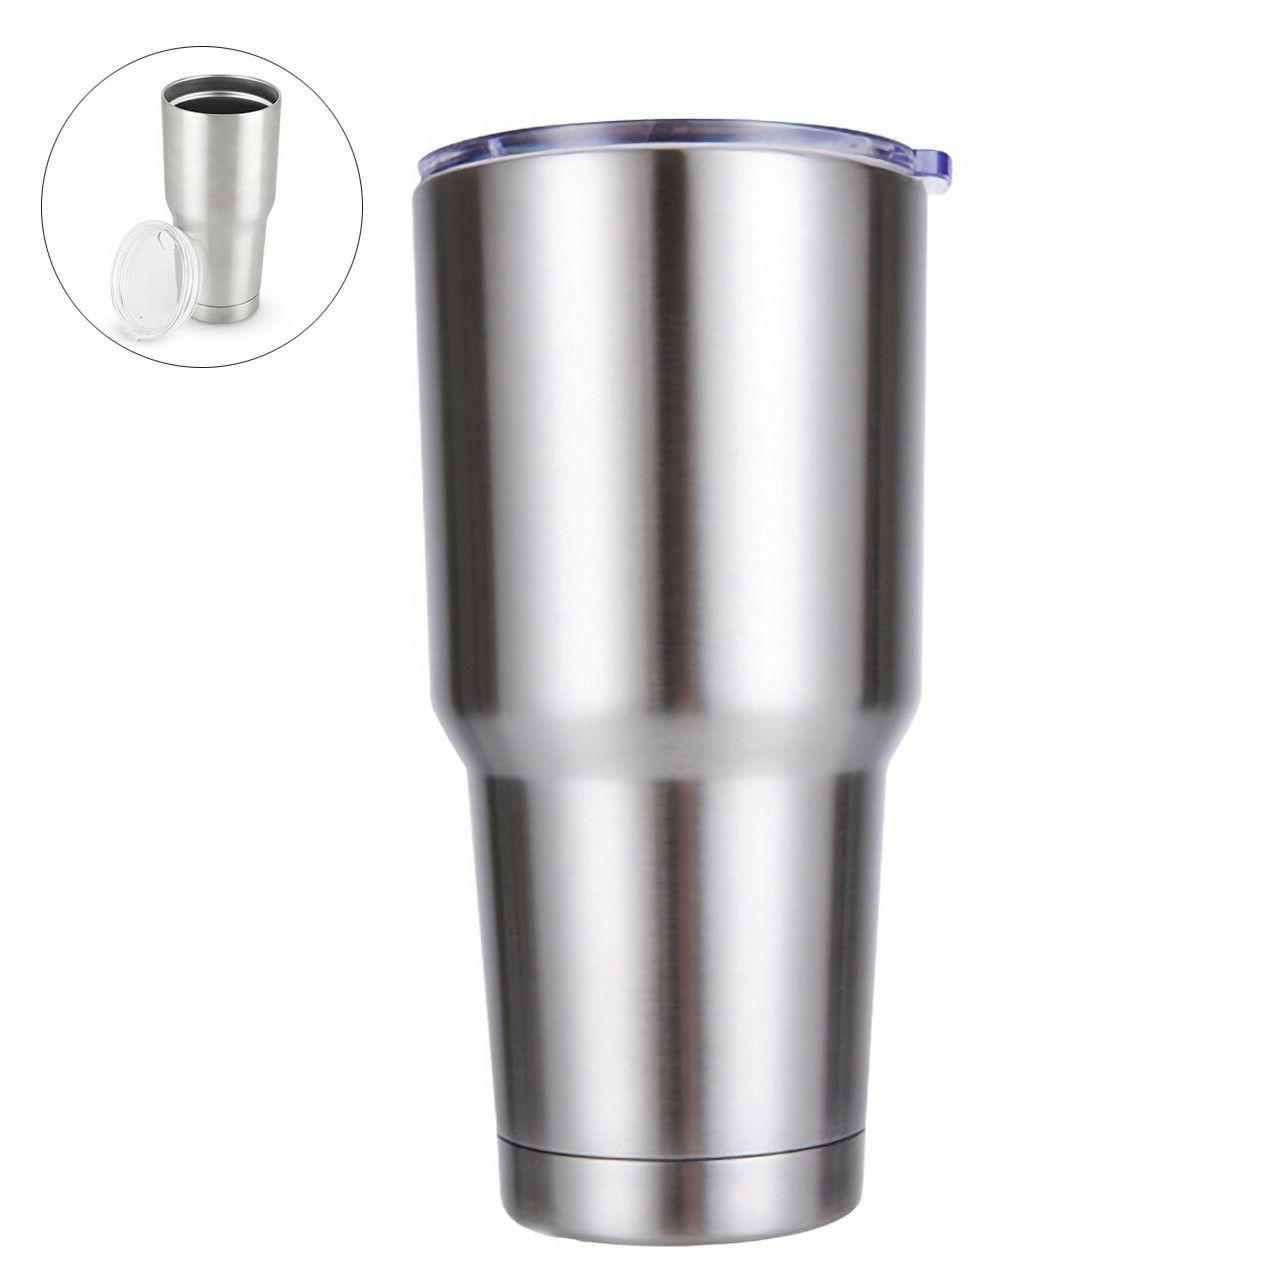 travel mug 30 oz stainless steel tumbler